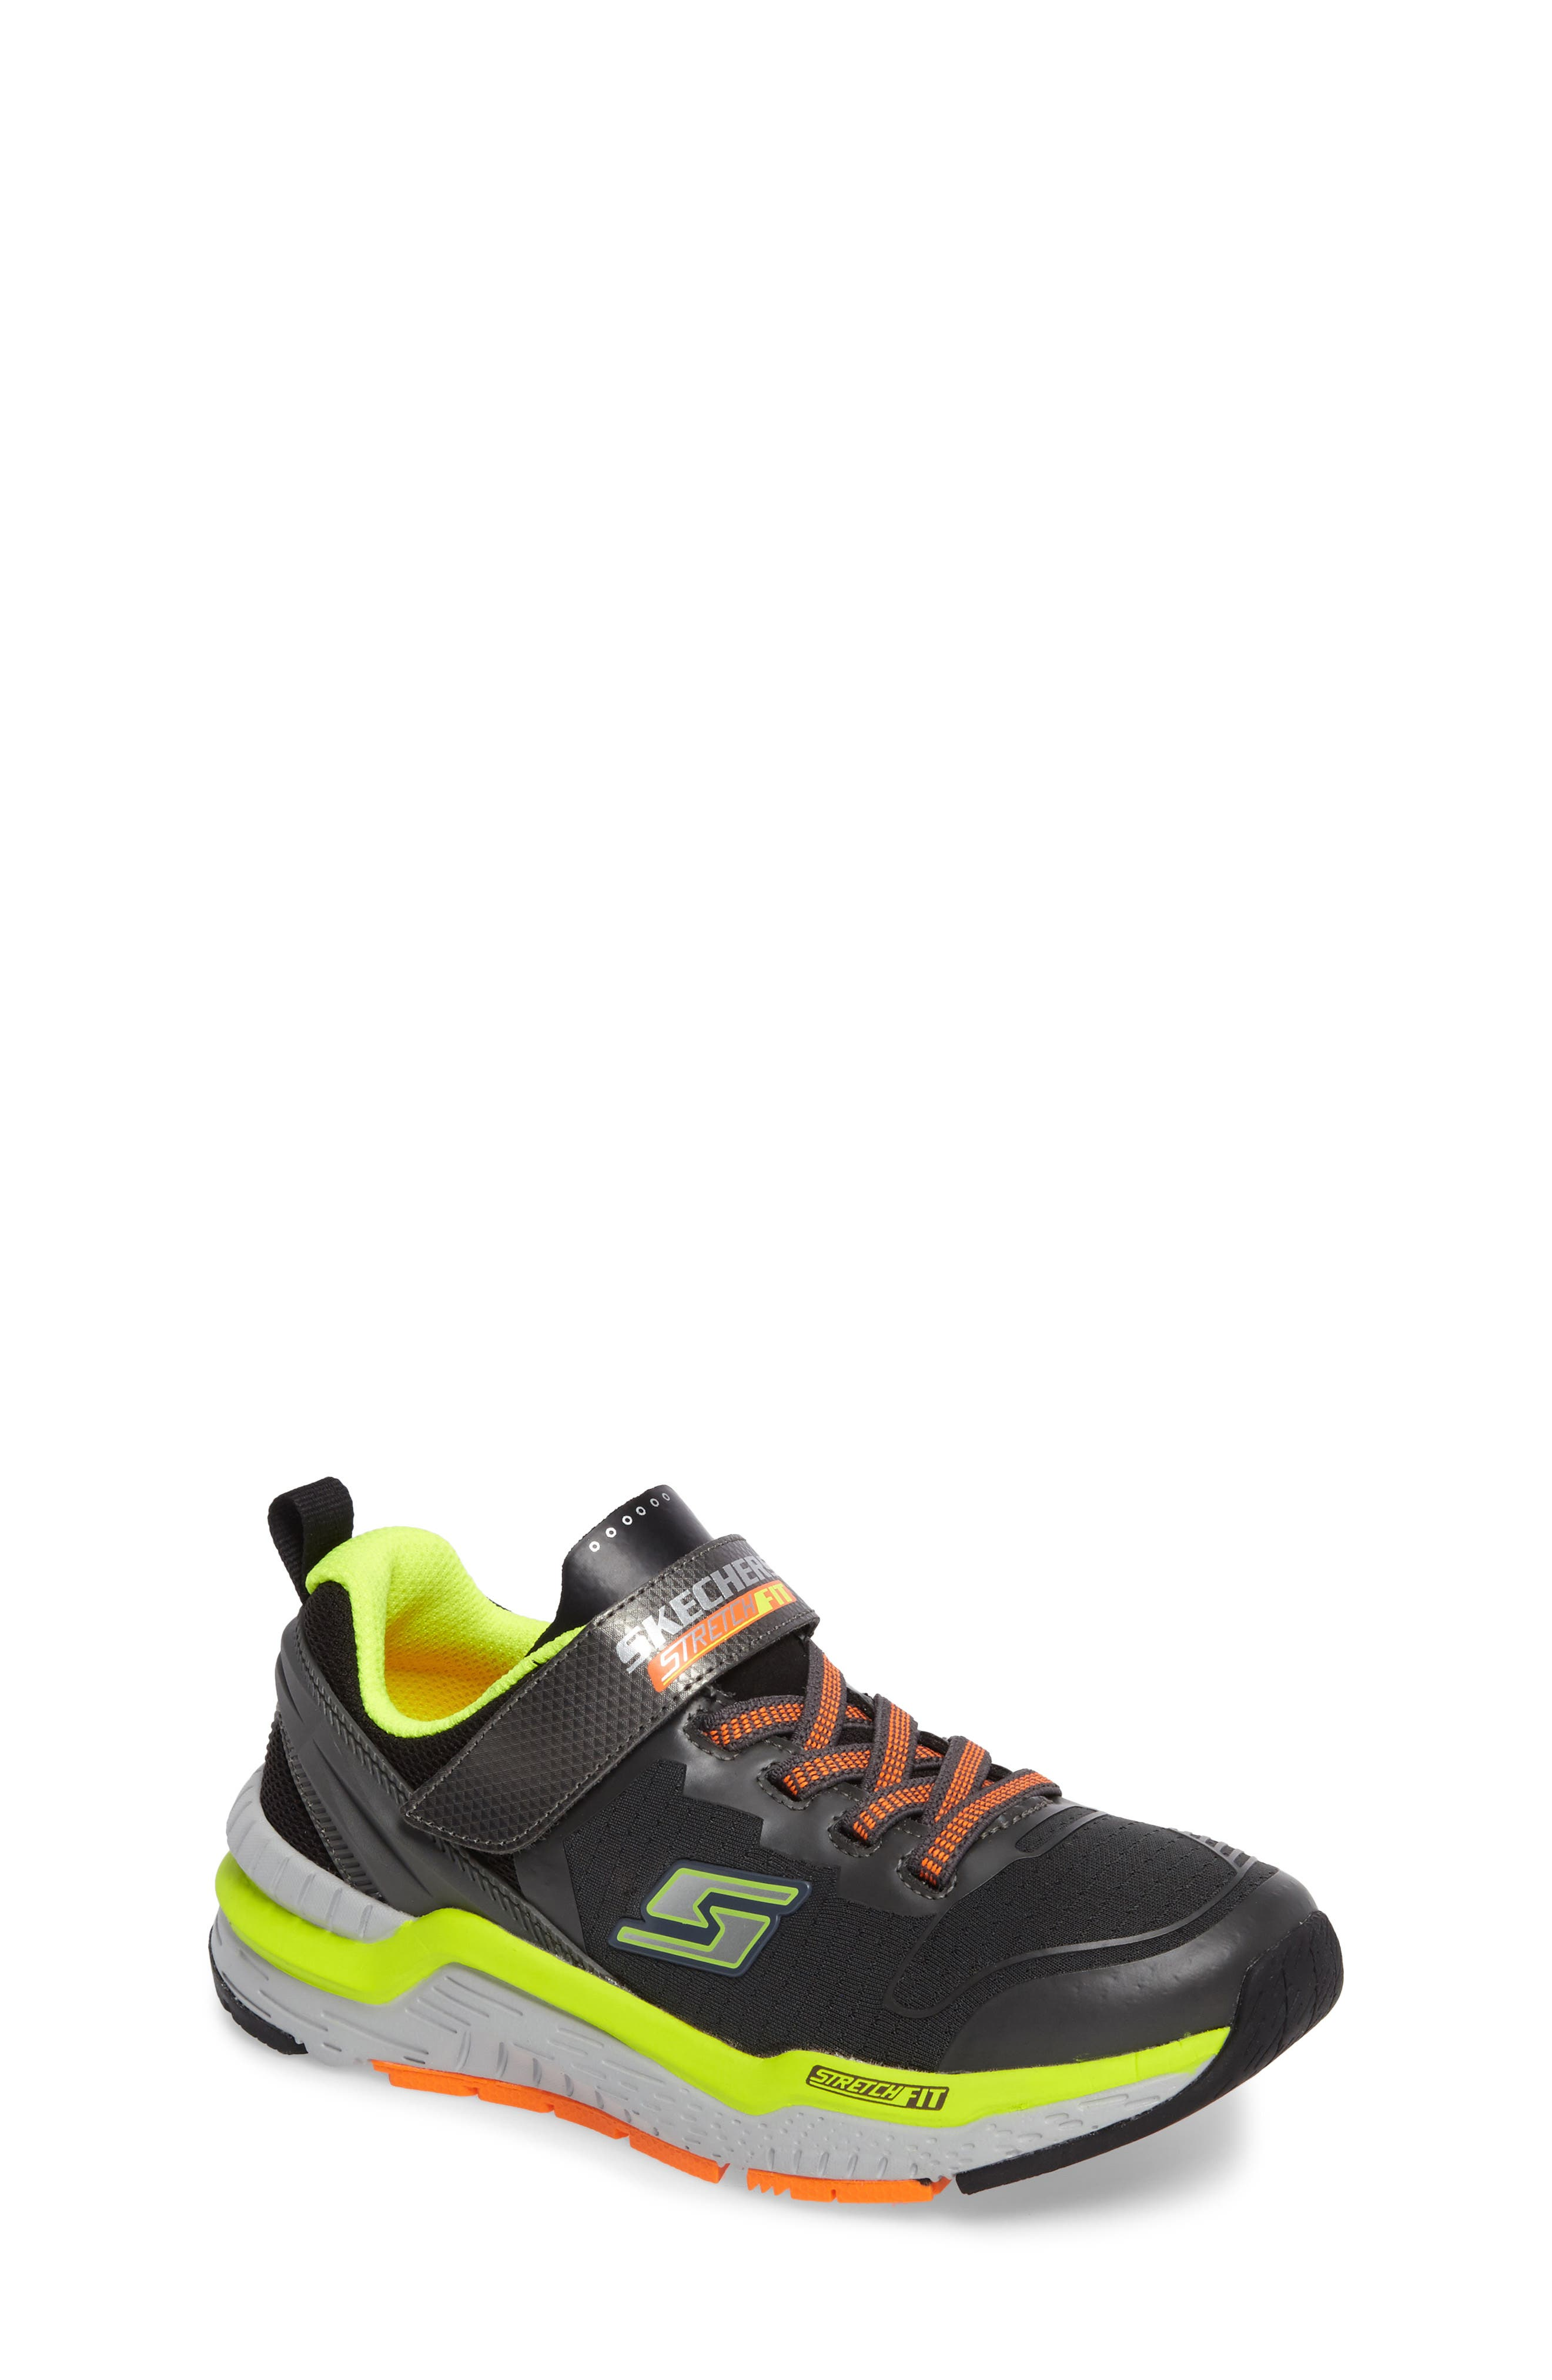 Hyperjolt Sneaker,                         Main,                         color, Charcoal/ Black/ Lime